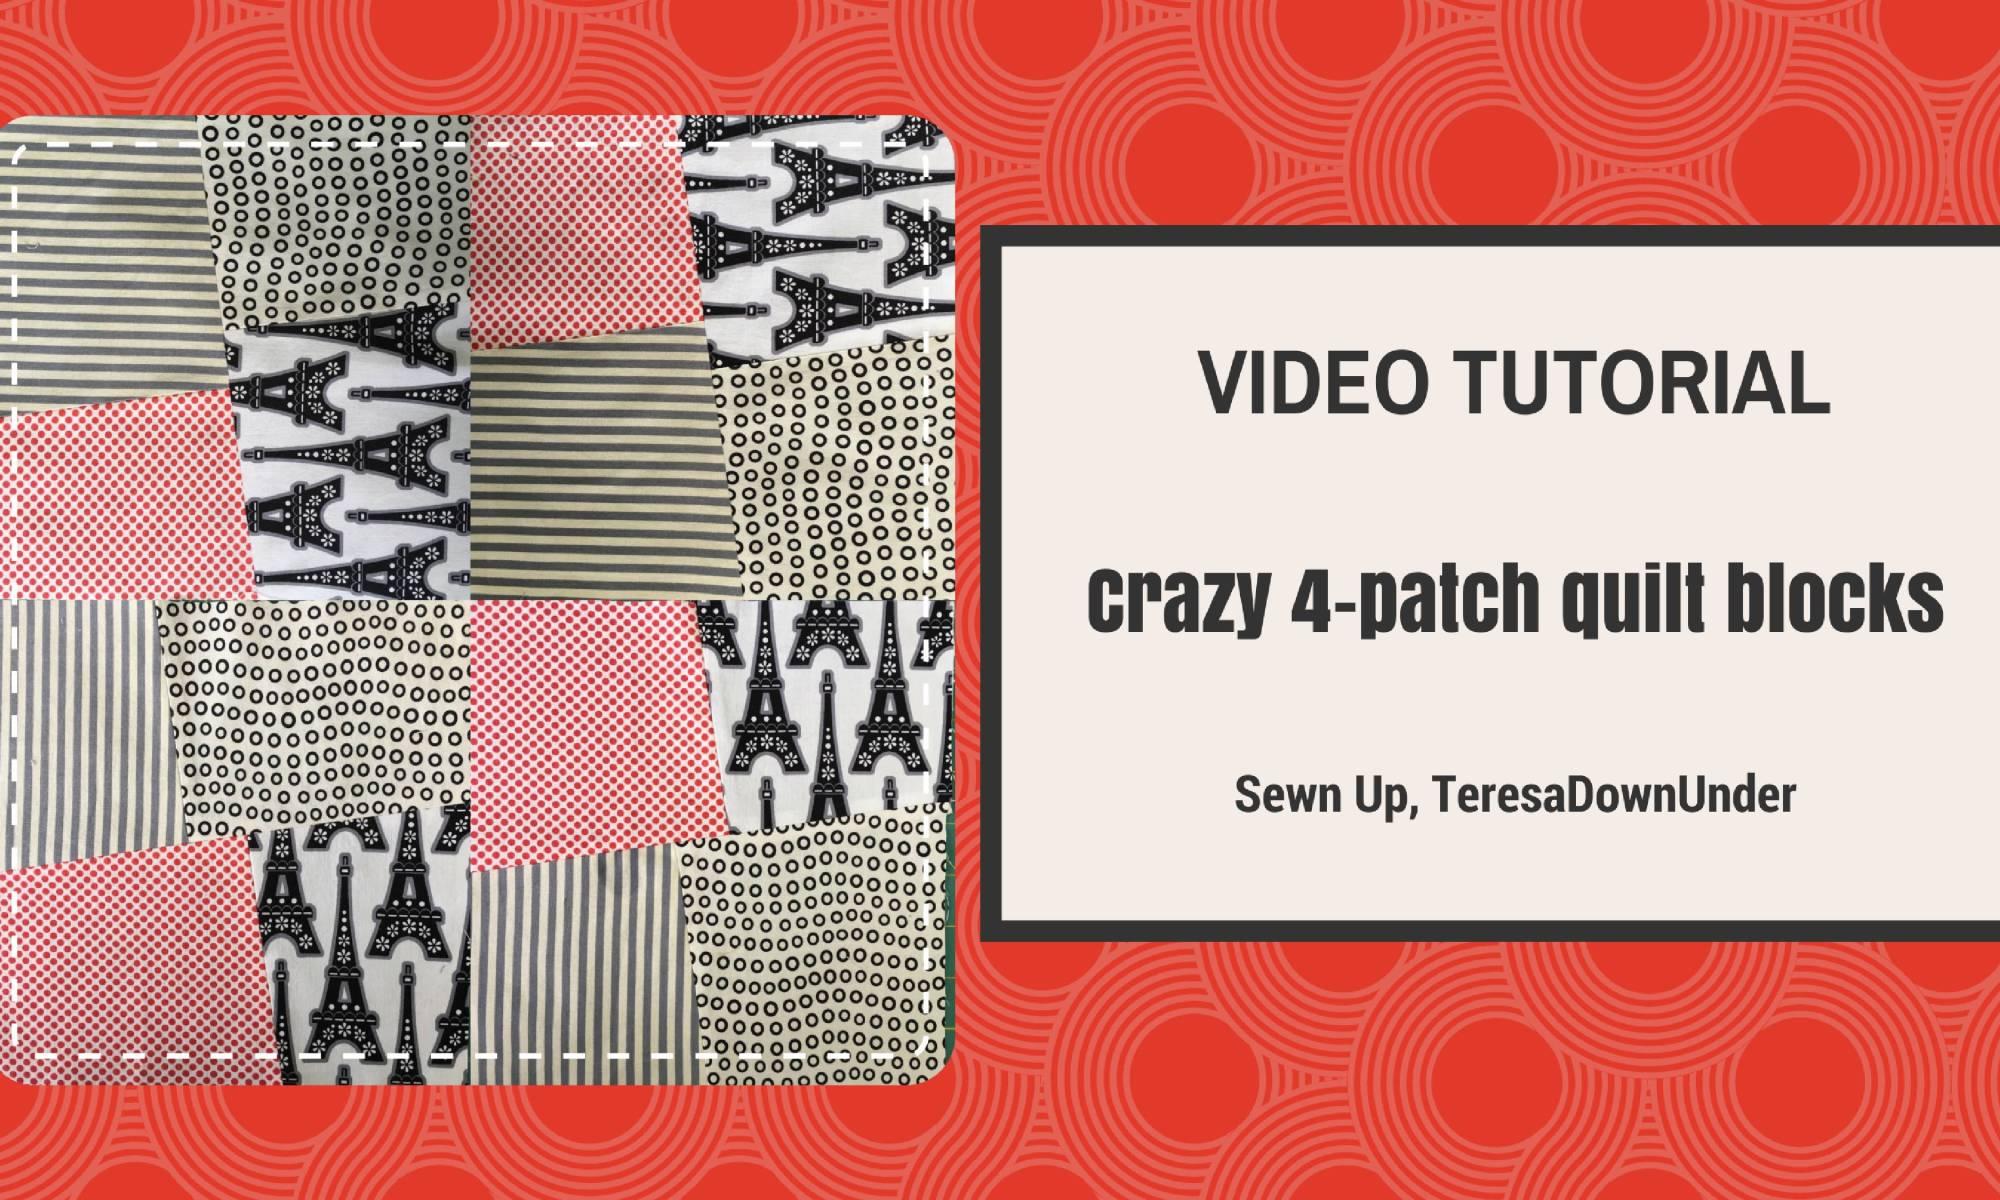 Video turorial: crazy 4-patch quilt block